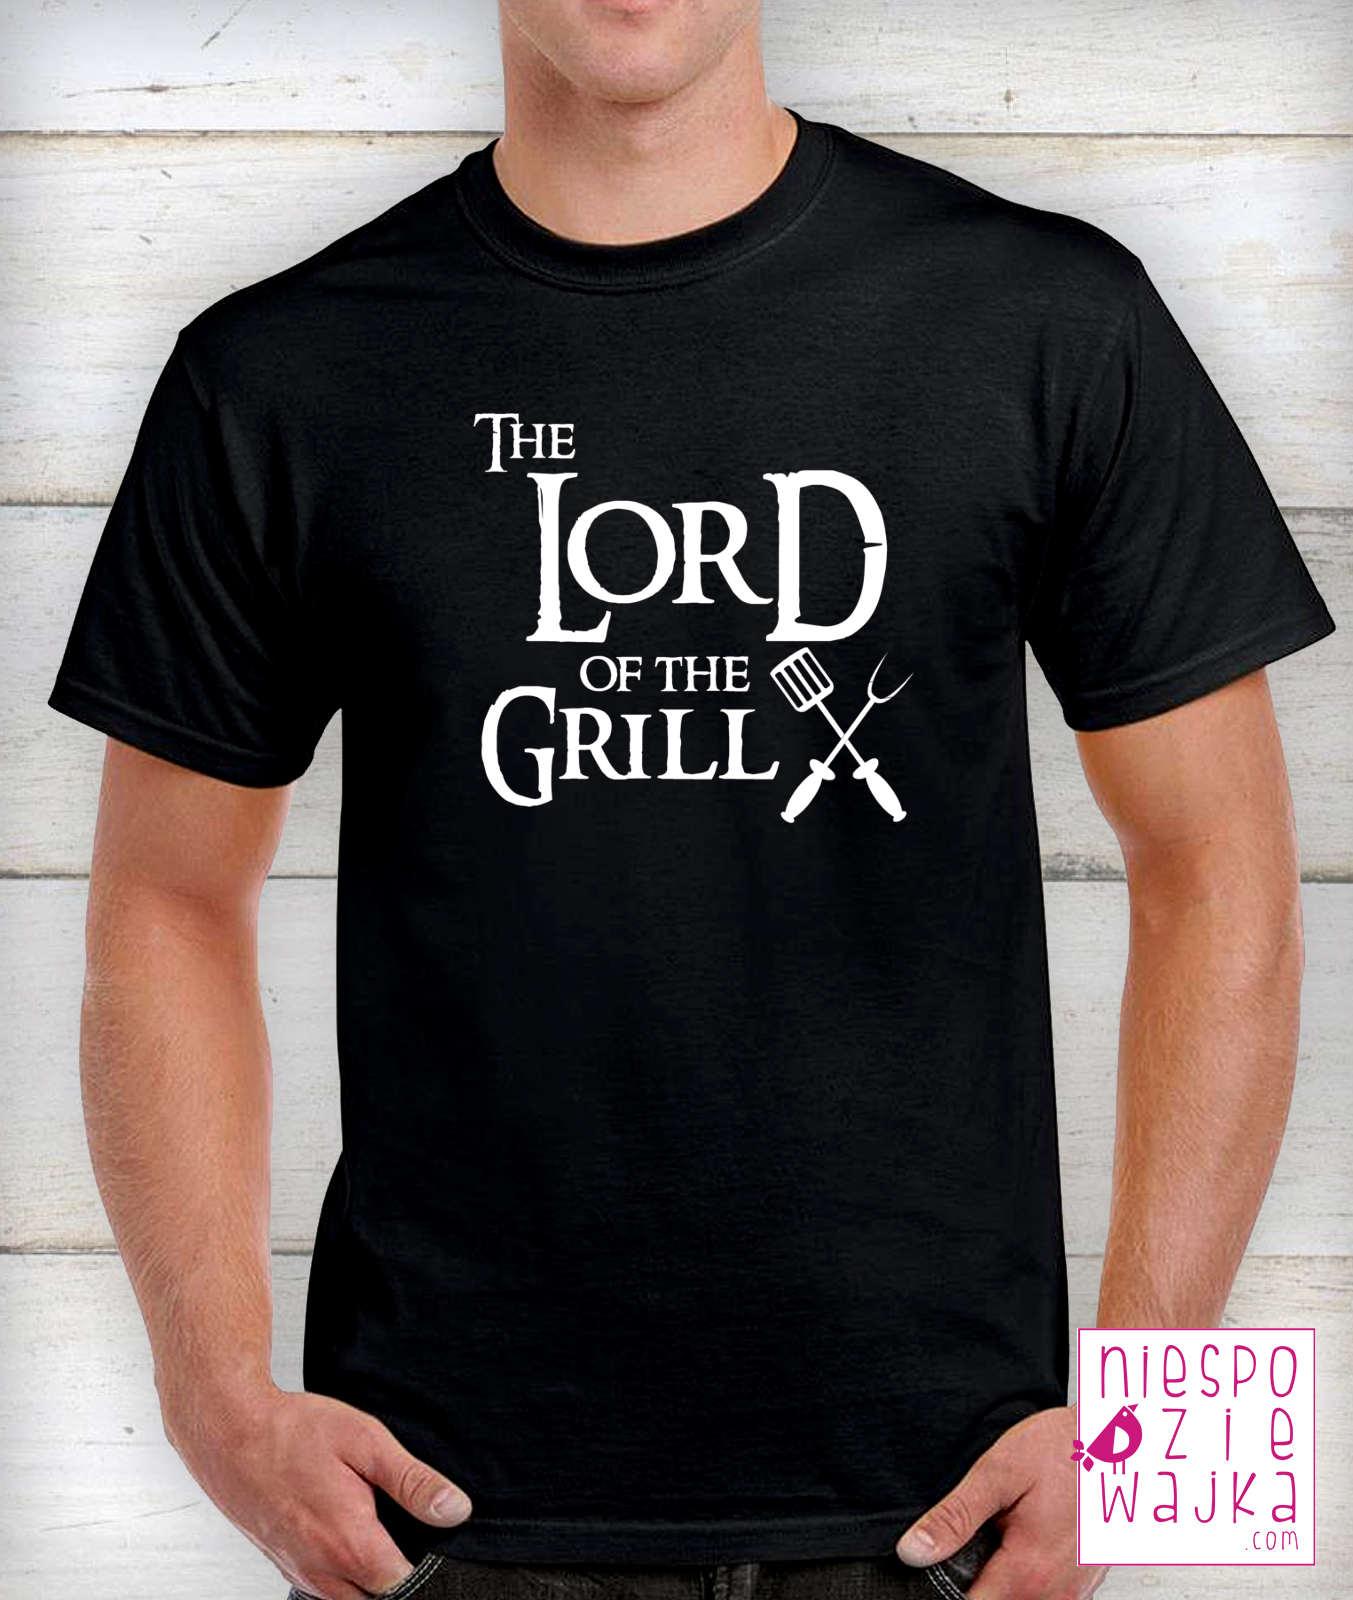 f84efb245 Koszulka The Lord of the Grill